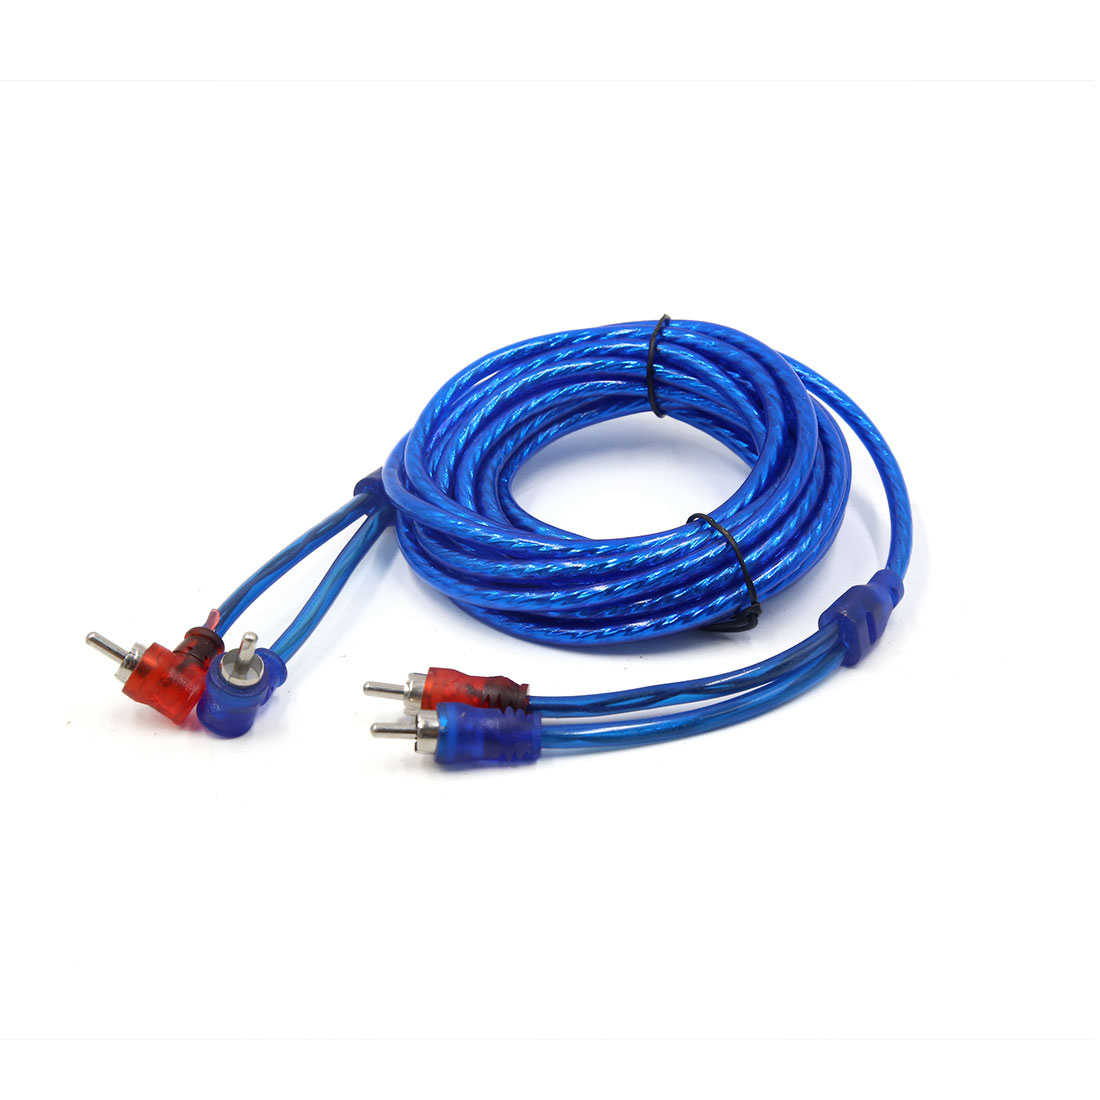 Blue 14.7 Ft Length Double Shielded Car RCA Stereo Audio